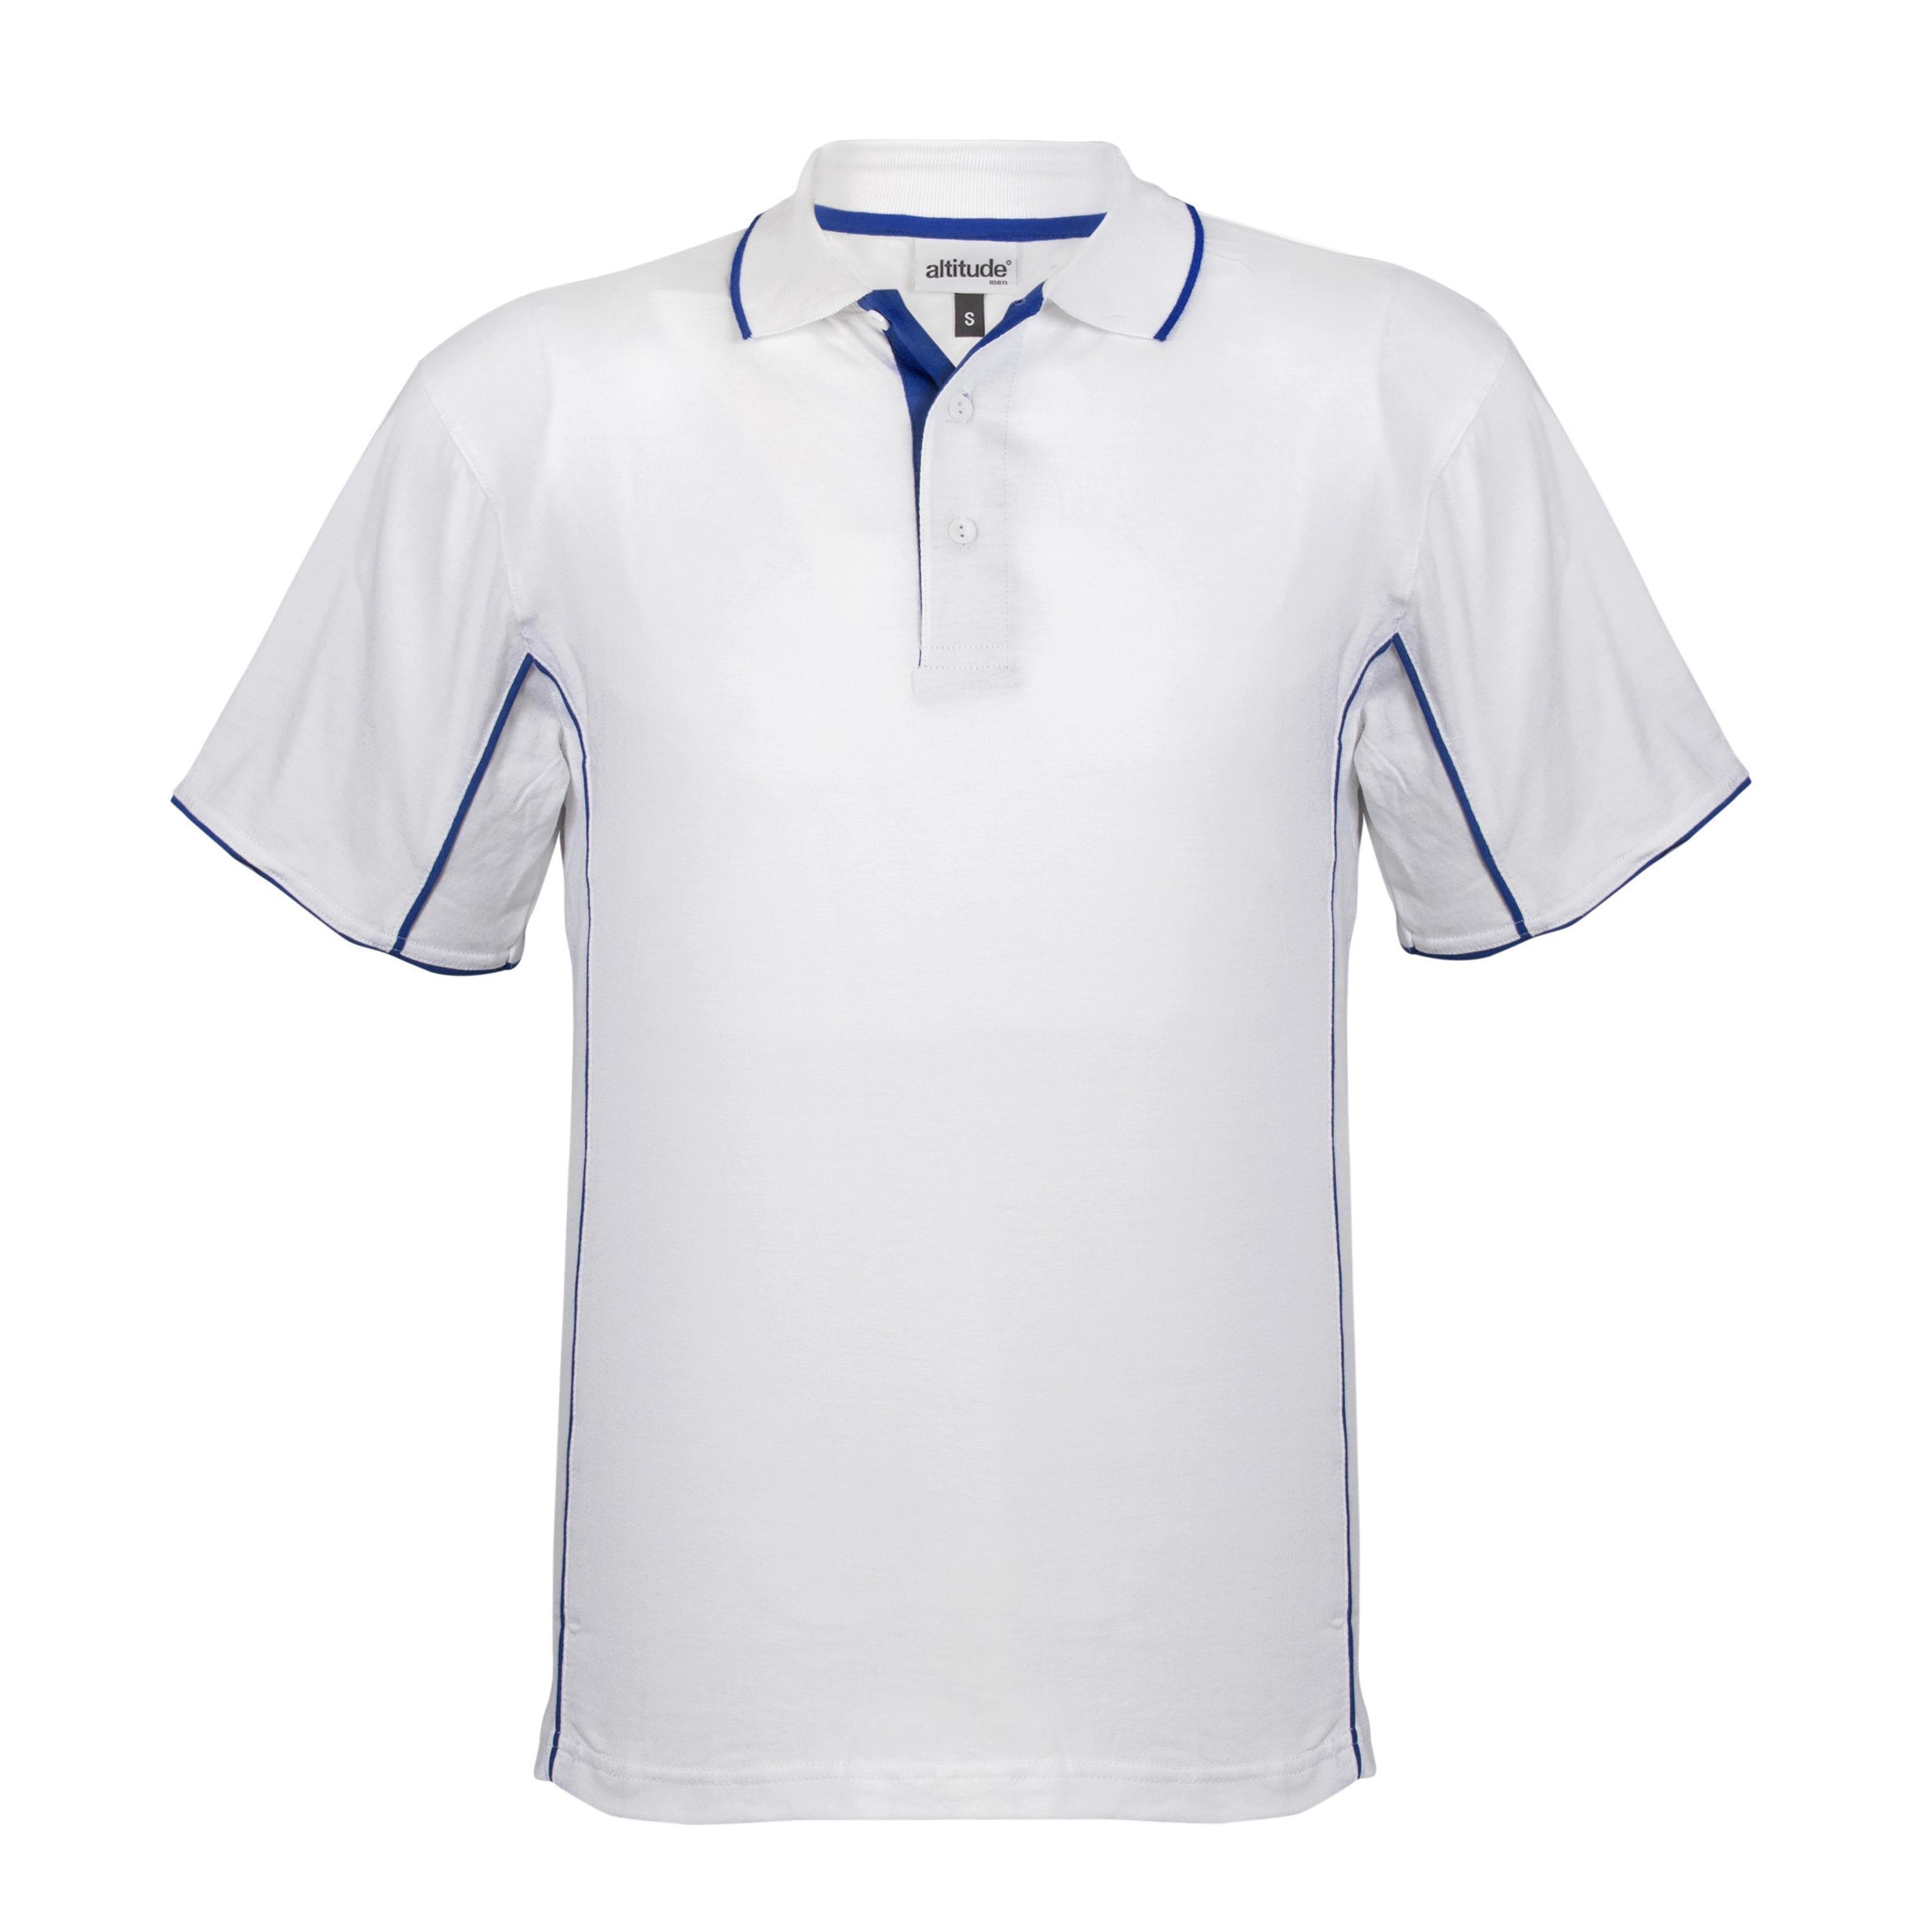 Mens Denver Golf Shirt - White And Blue Only